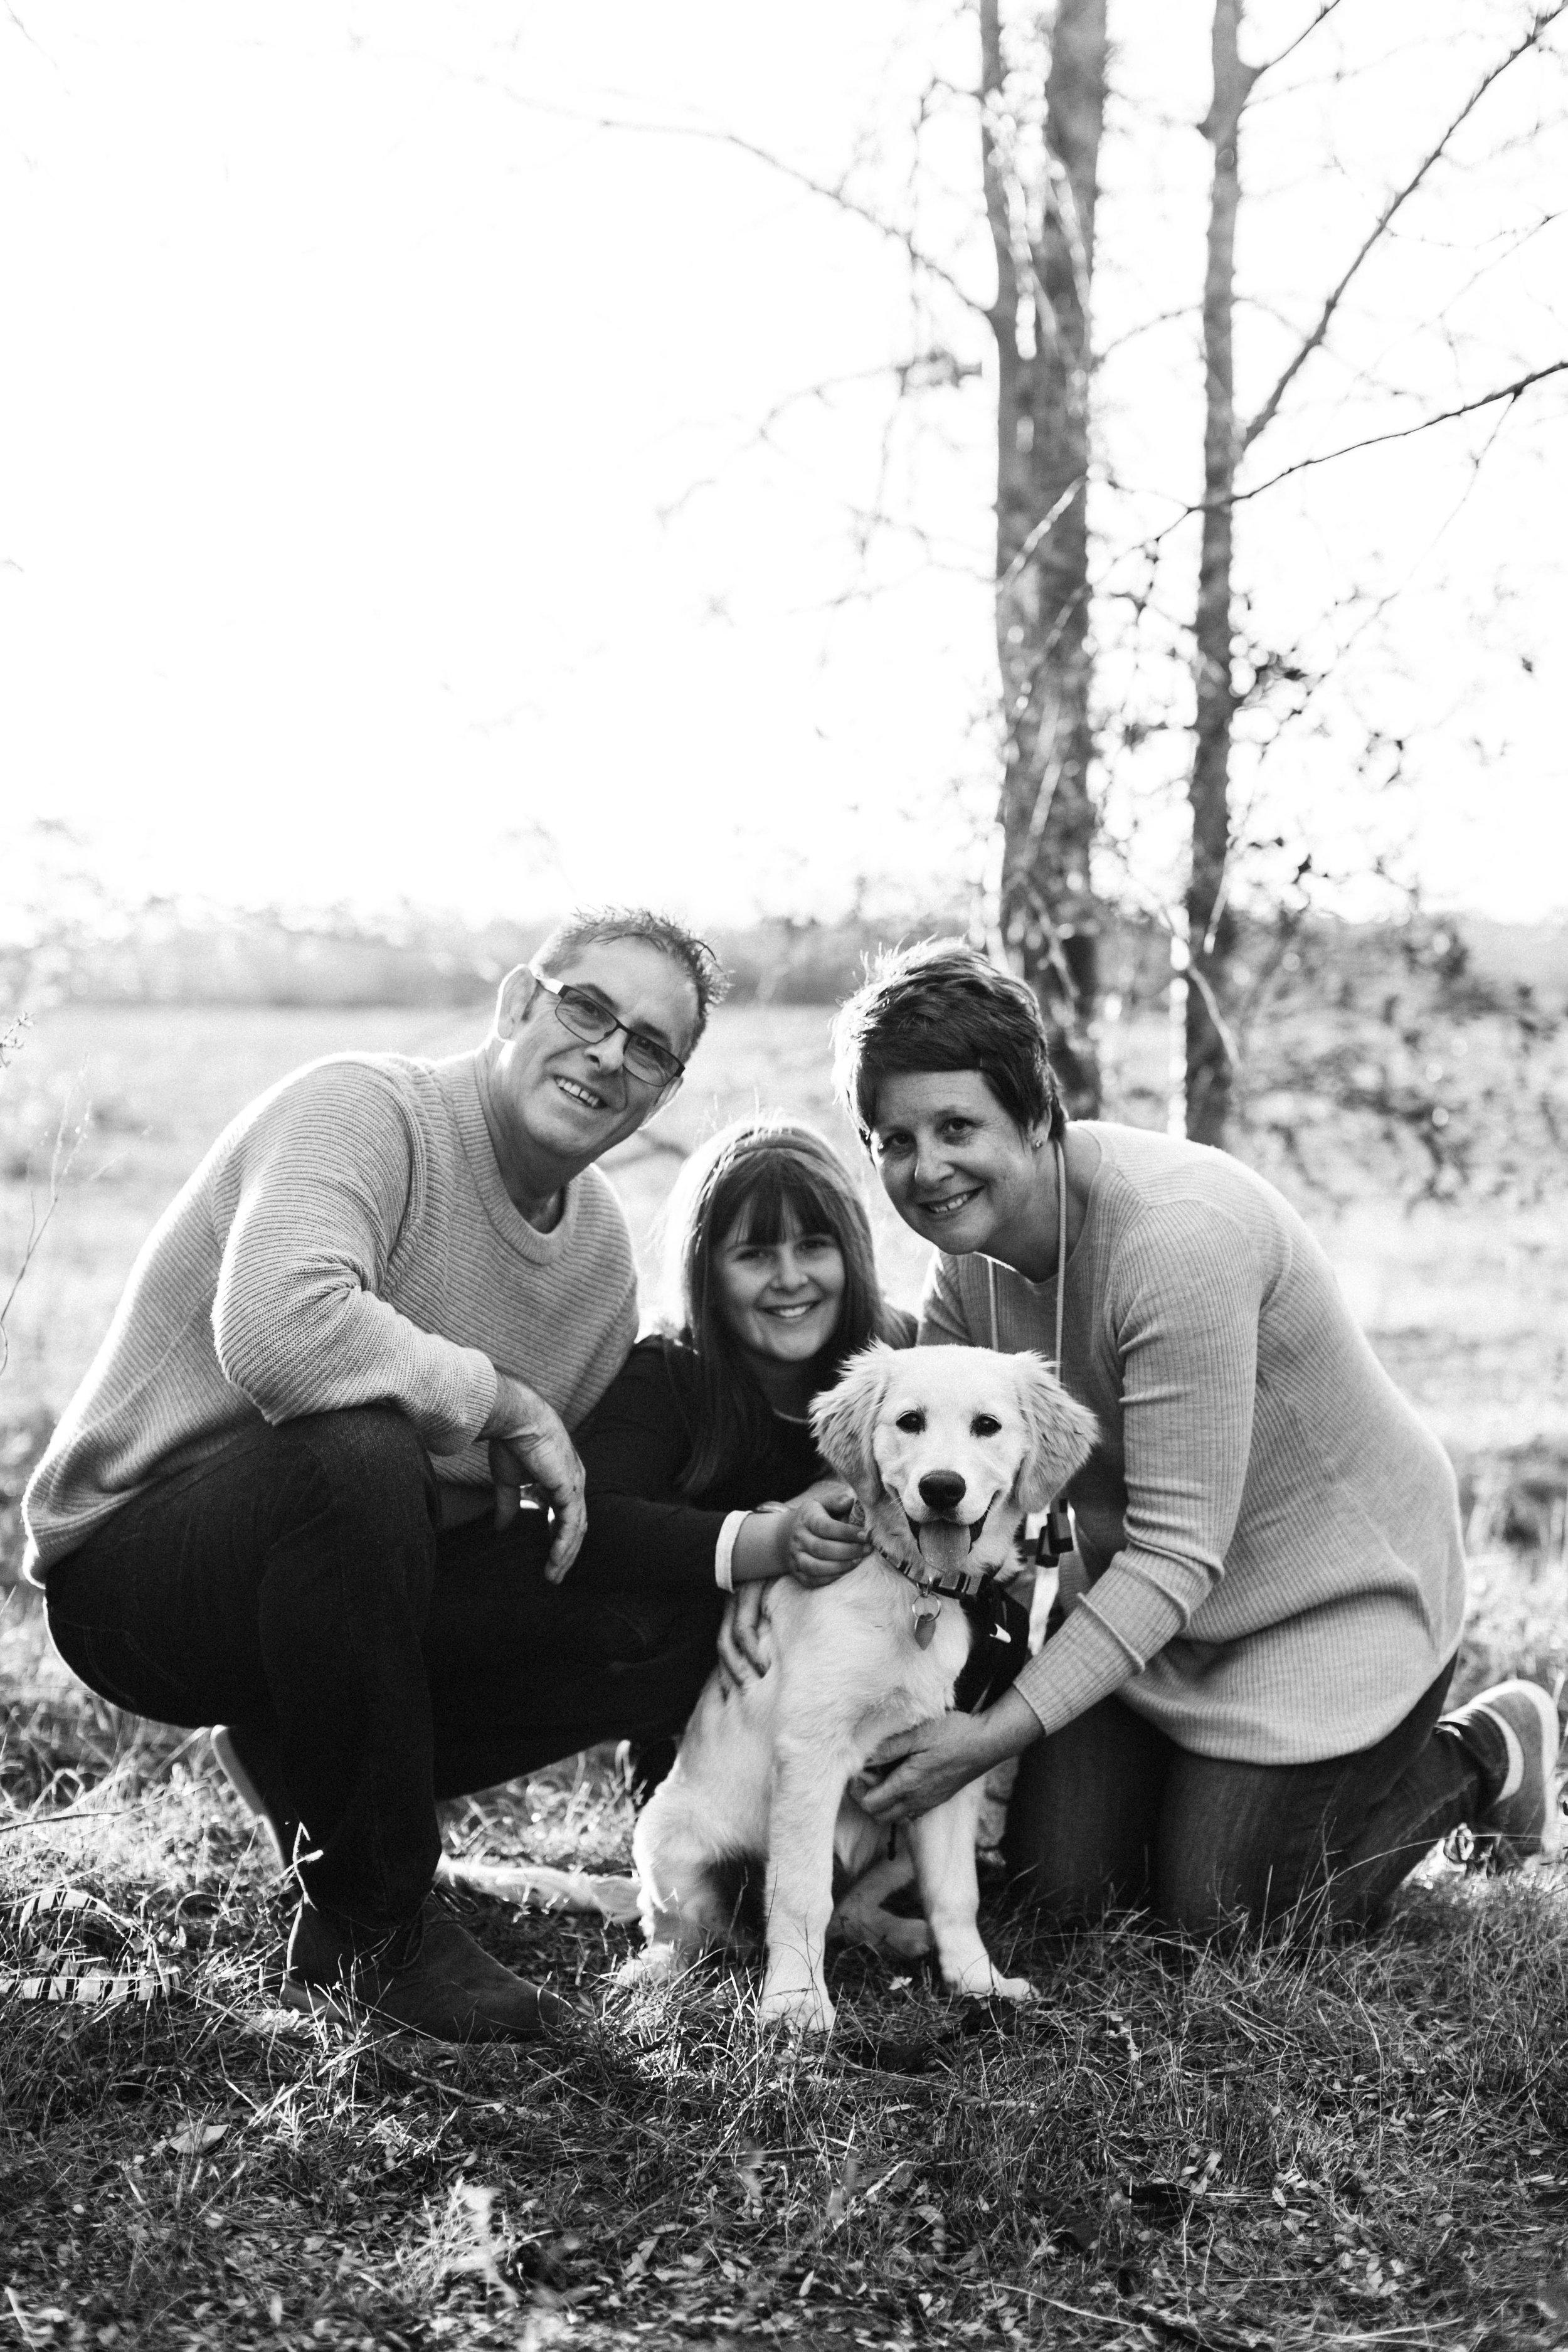 camden-macarthur-family-photography-www.emilyobrienphotography.net-10.jpg